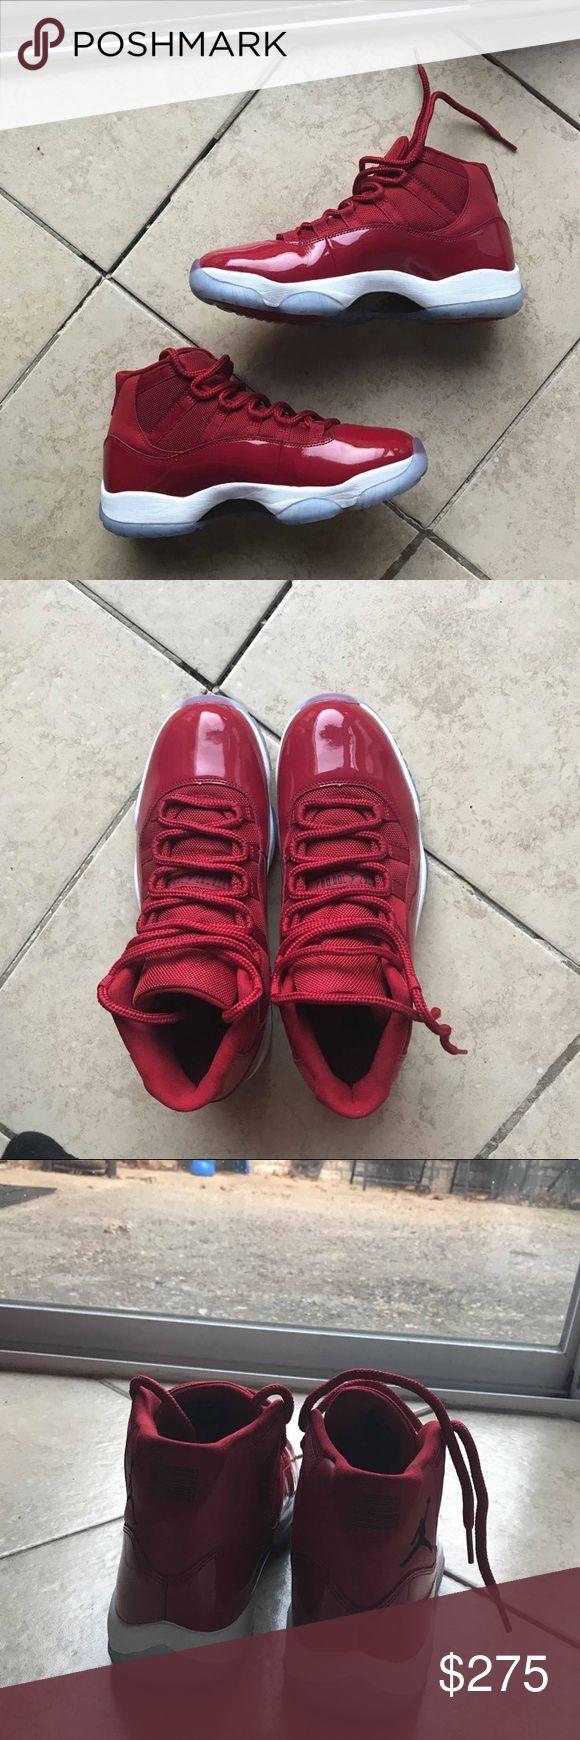 Jordan 11 Win like 96 gym red